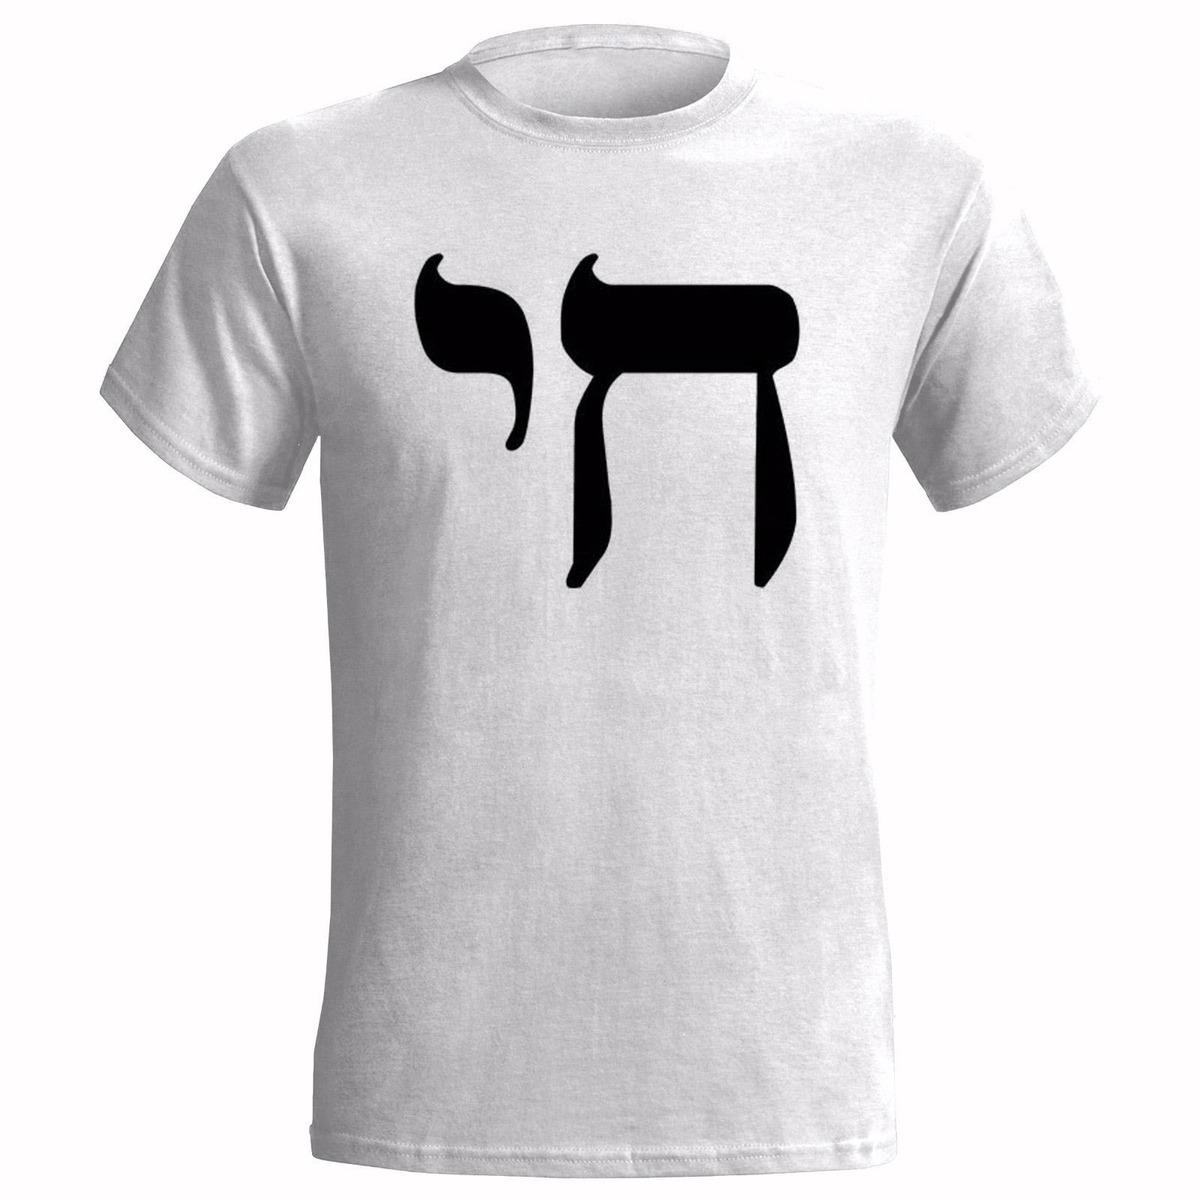 CHAI SYMBOL MENS T SHIRT HEBREW LIFE JEWISH JEW SIGN YIDDISH JUDAISM tshirt new fashion top 2018 officia shirts